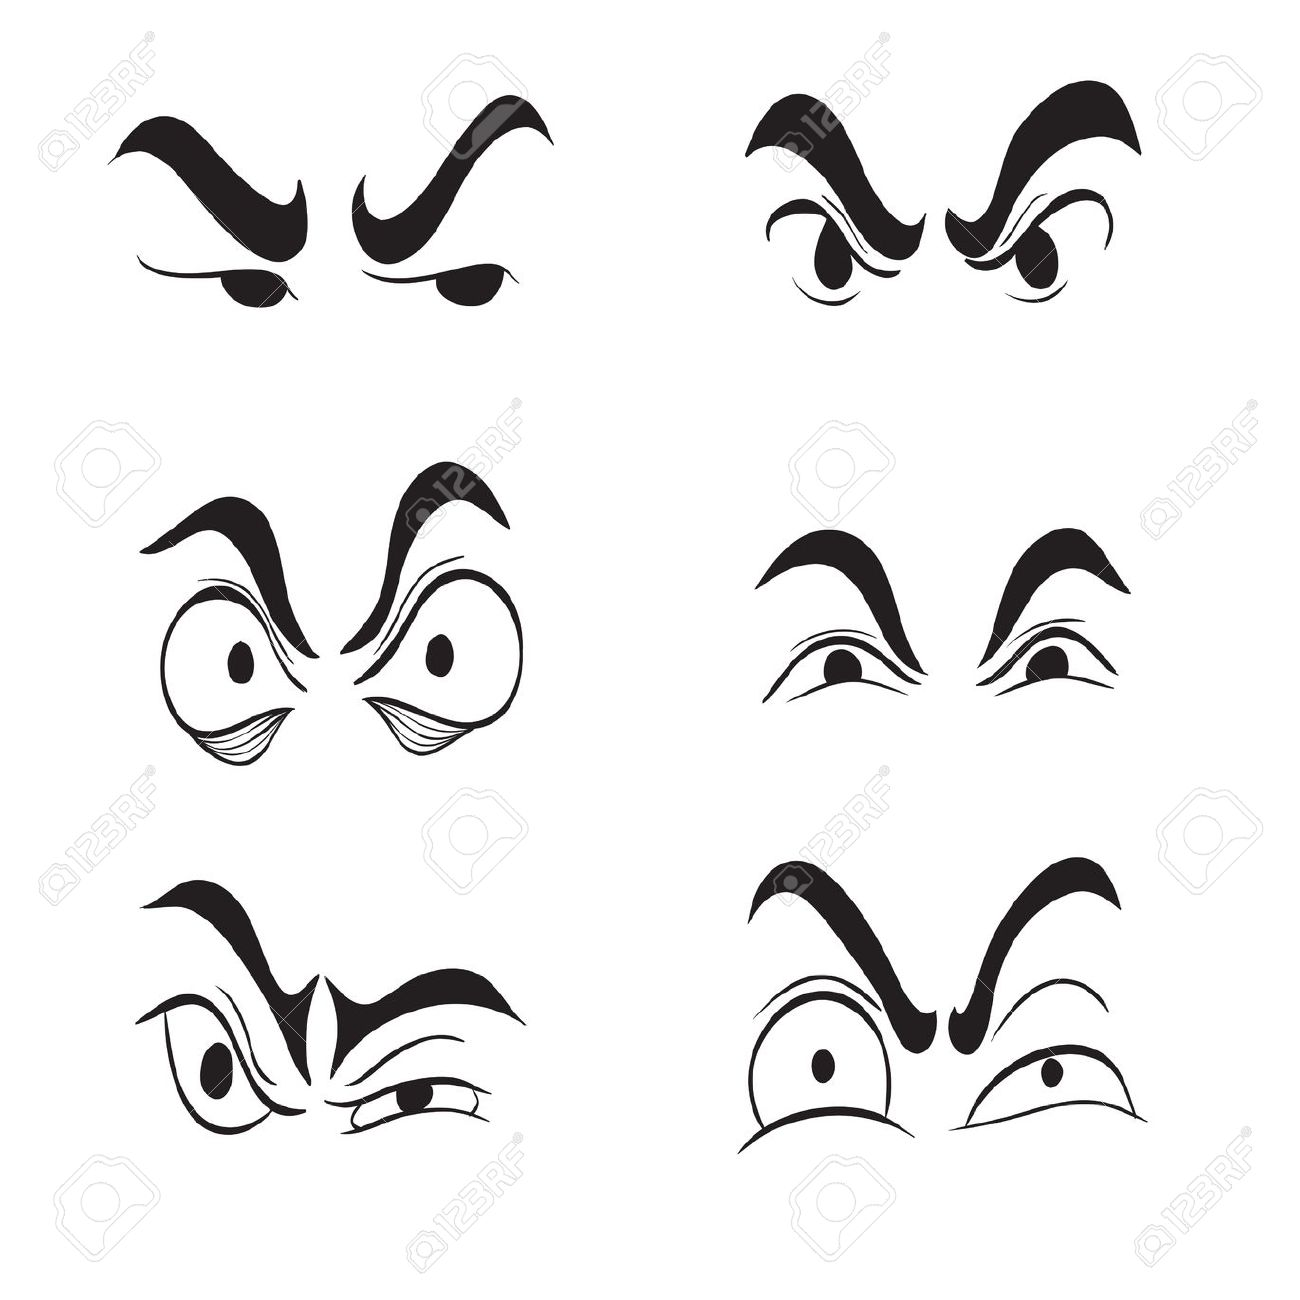 Eyeball clipart angry Clipart Eyes 149 20art Clipart